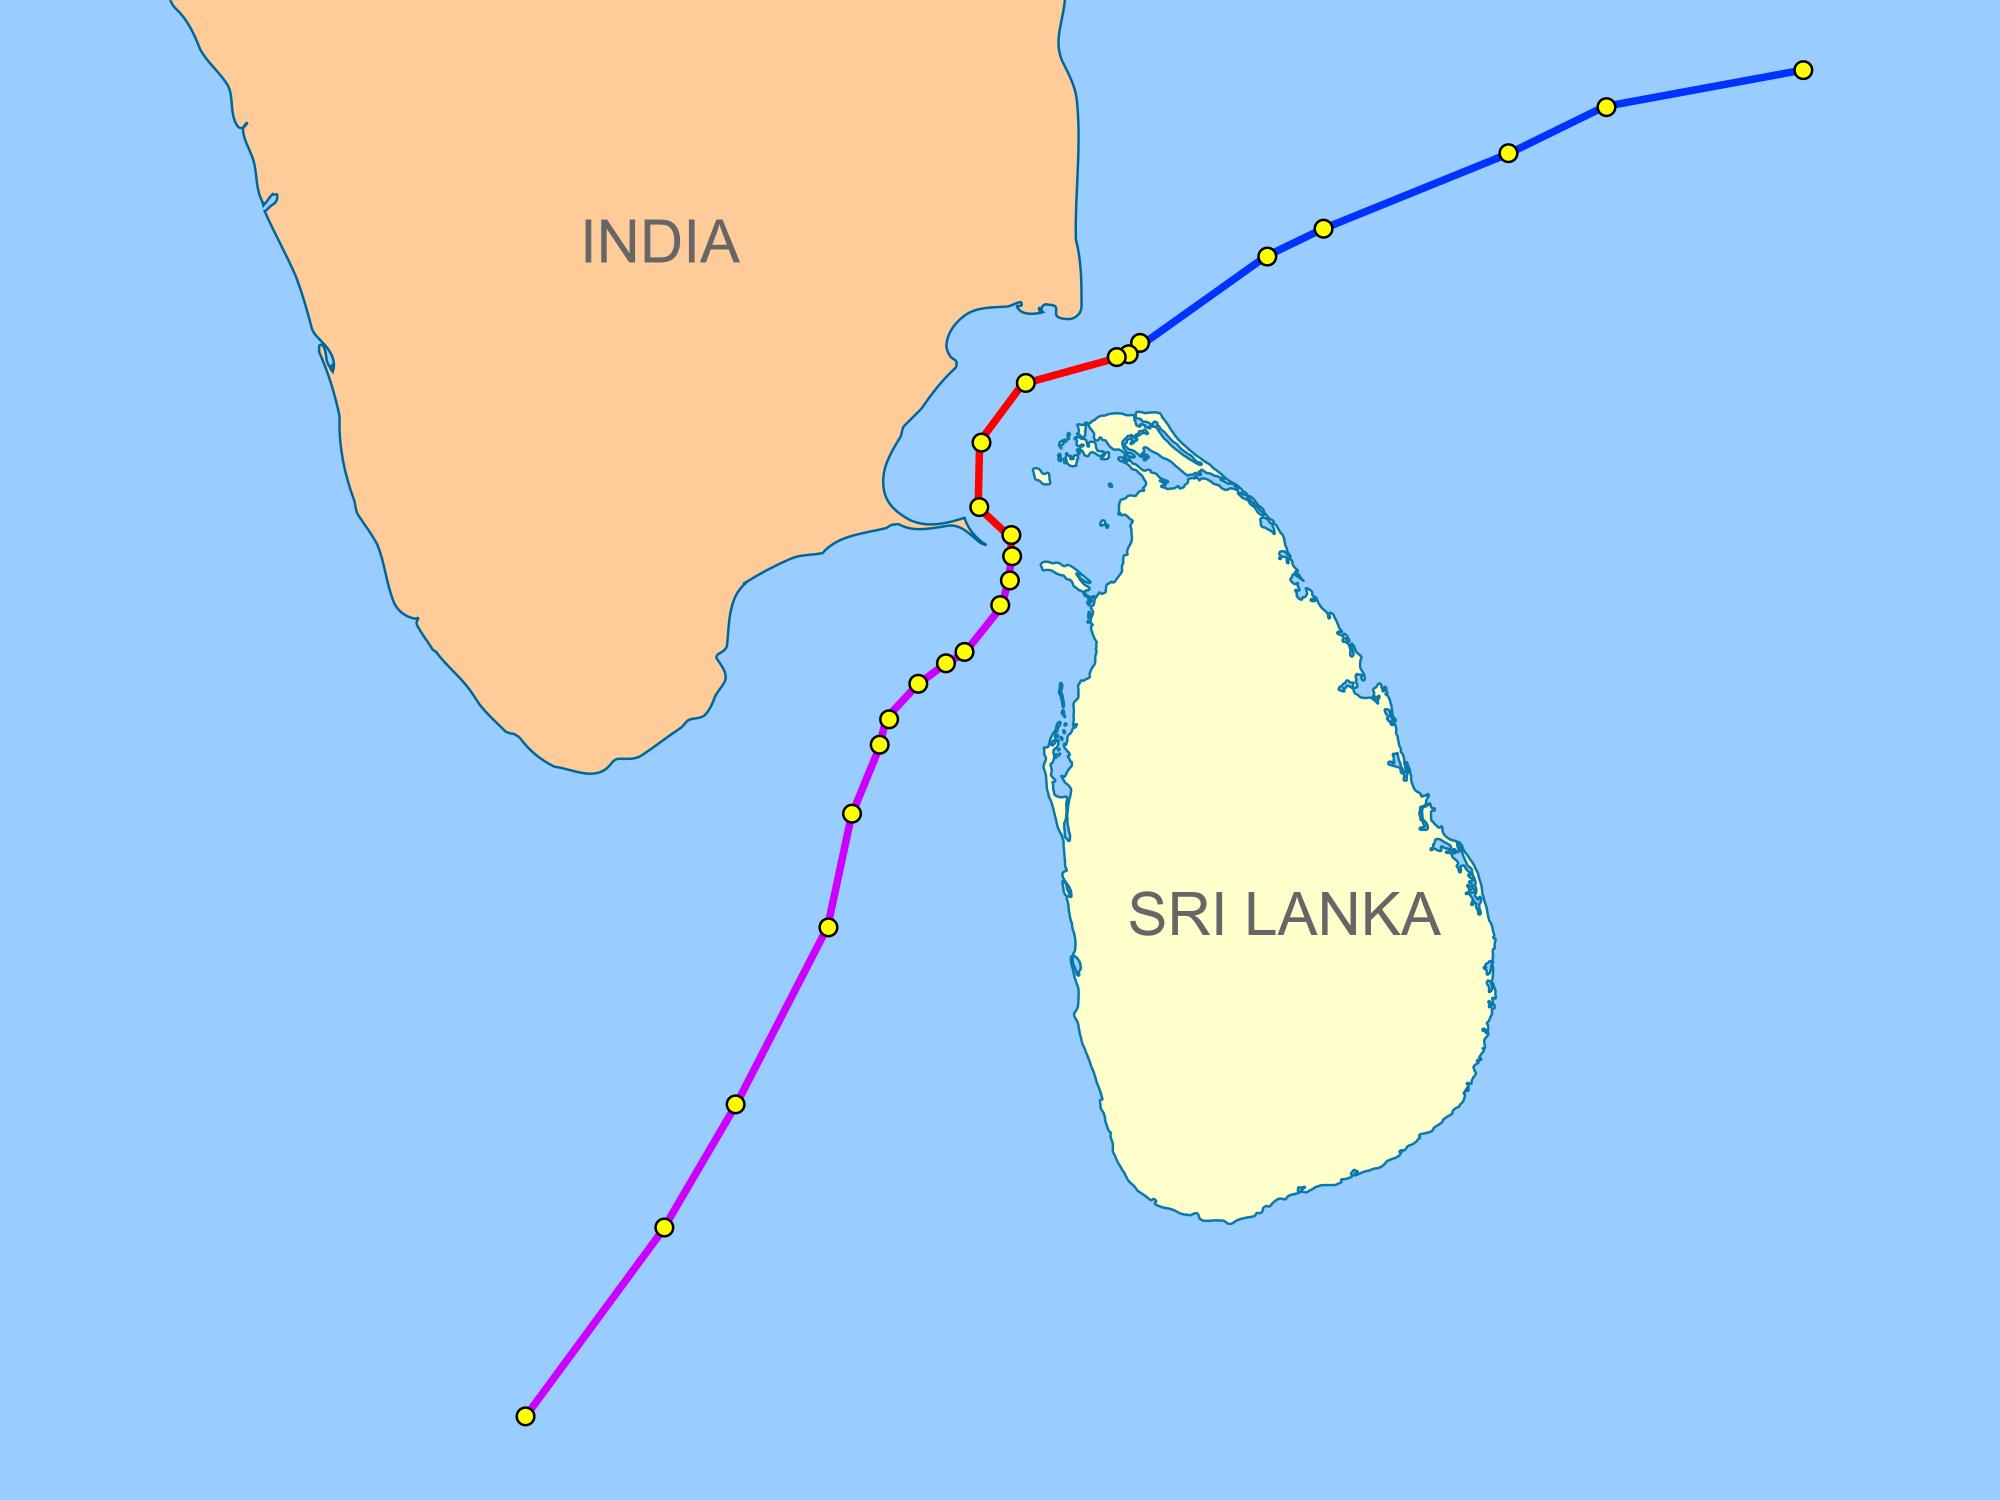 India–Sri Lanka maritime boundary agreements - Wikipedia